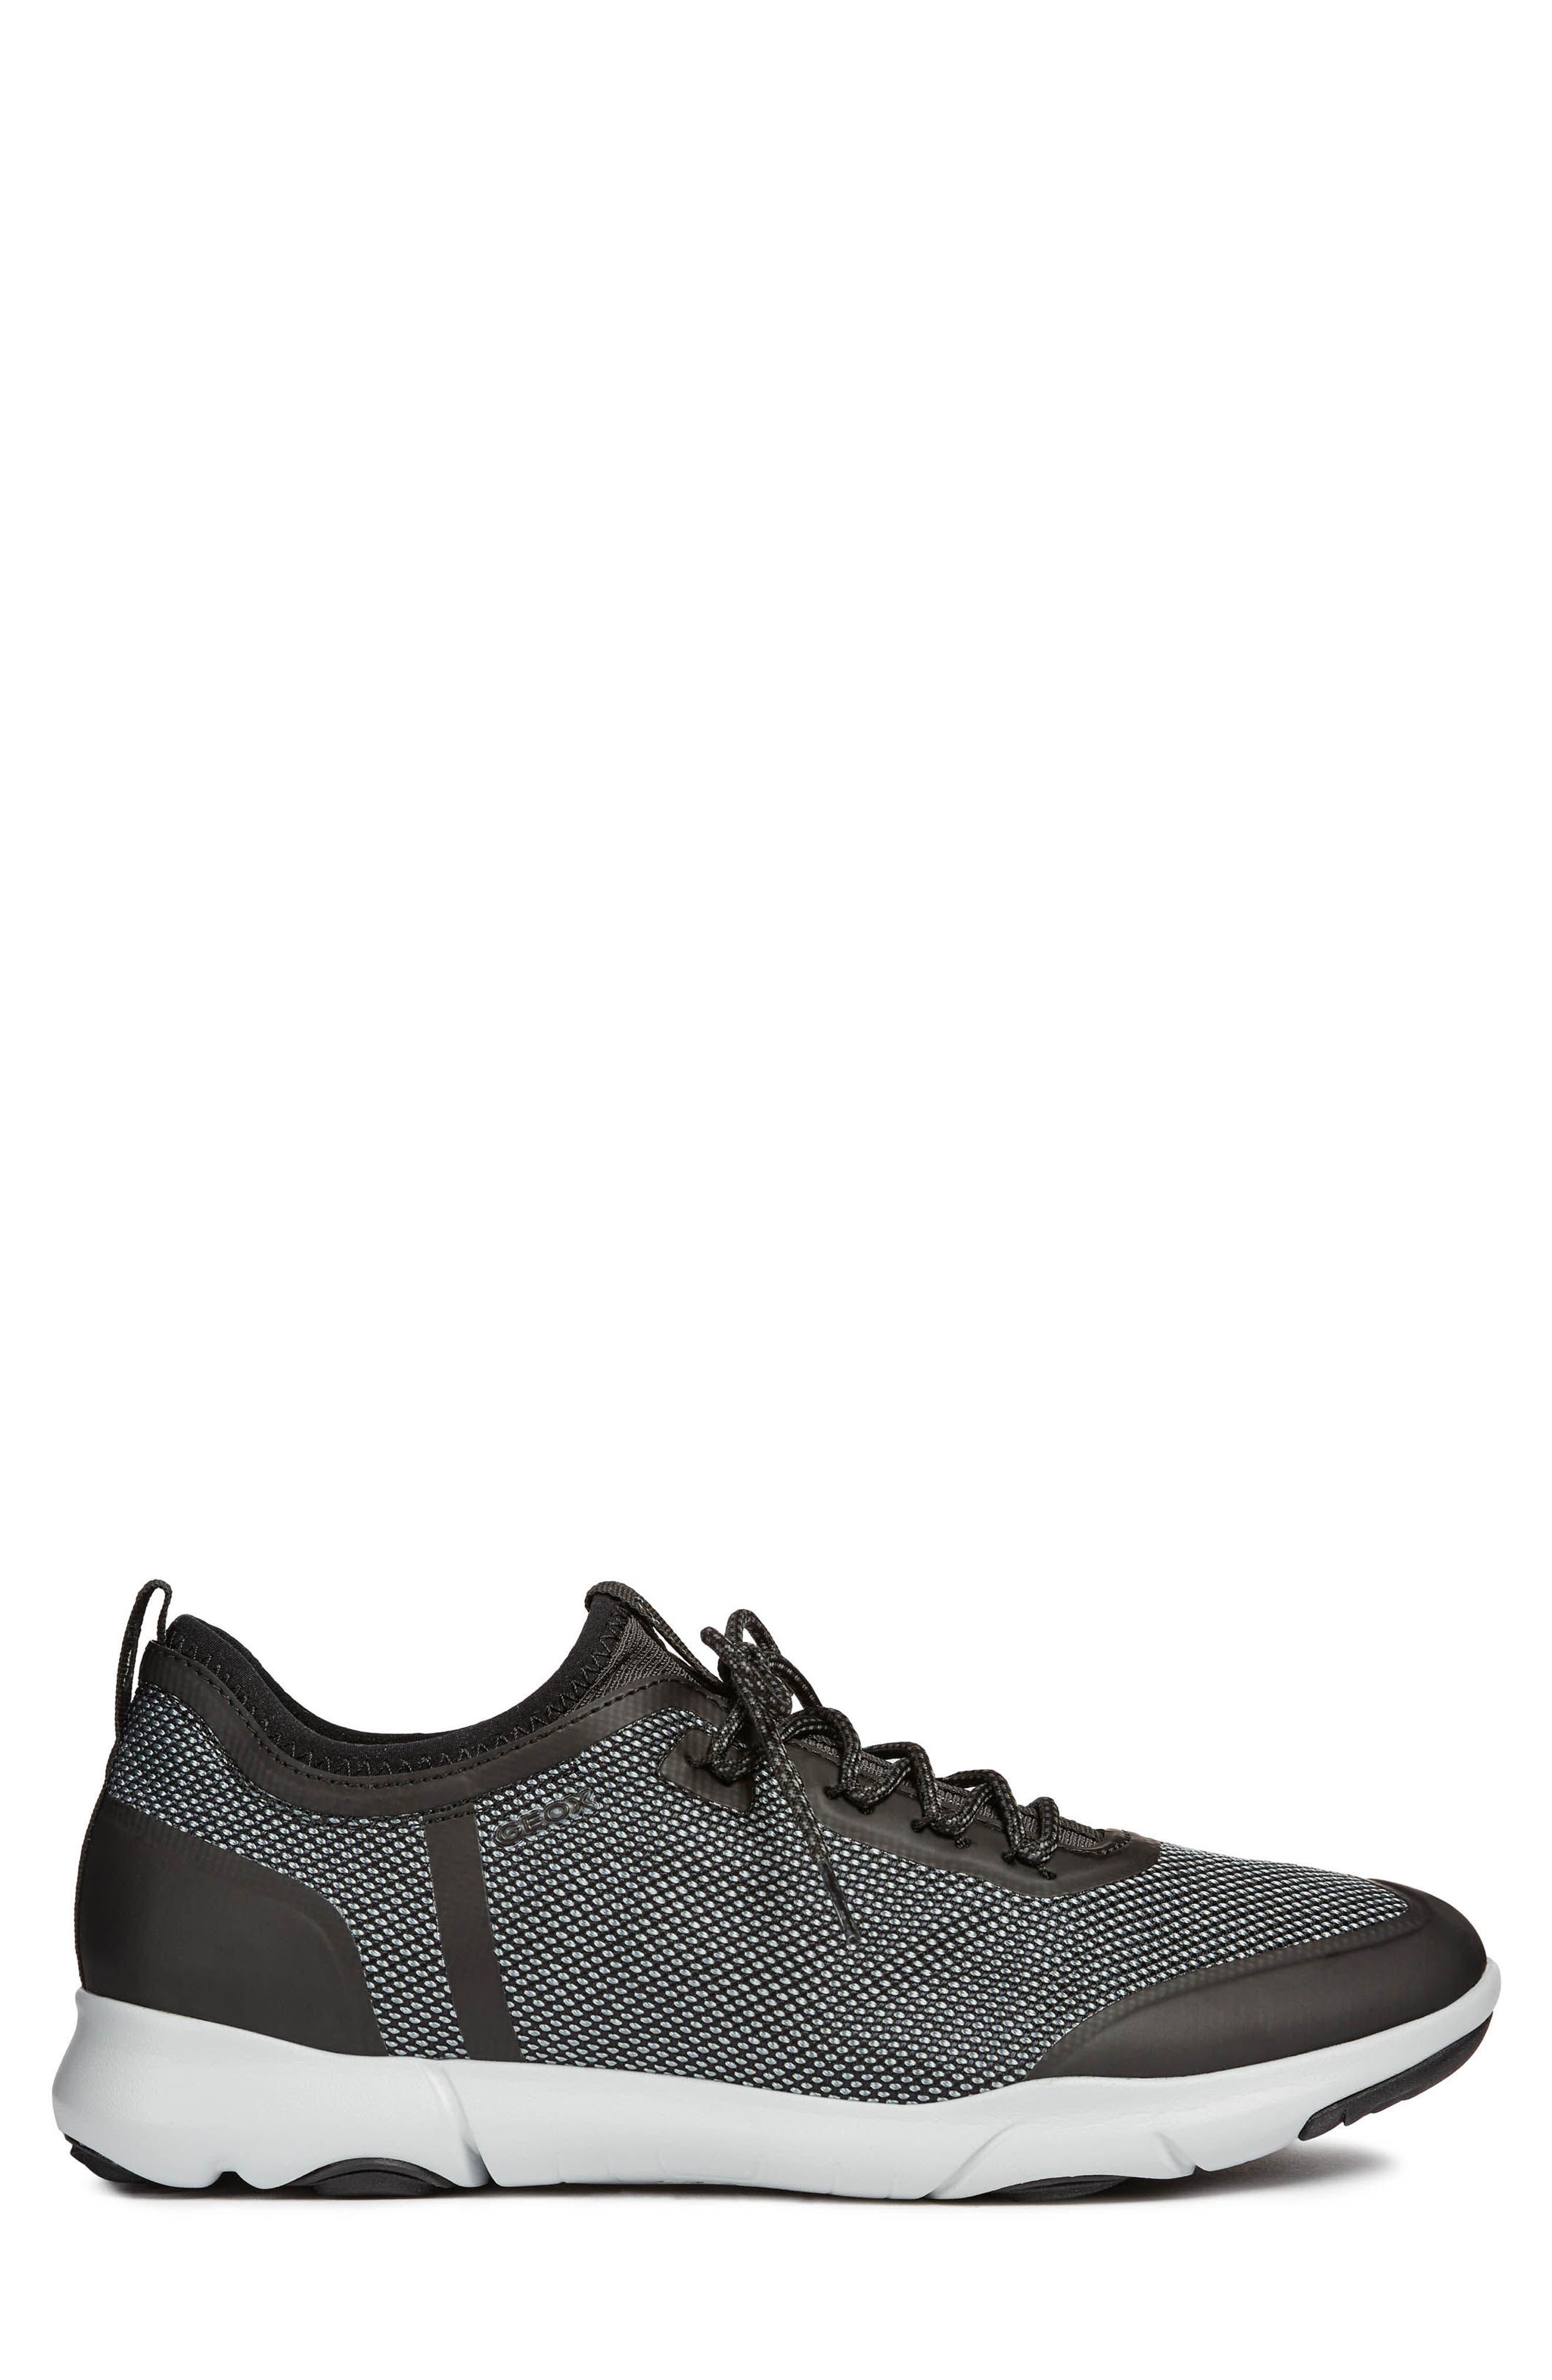 Nebula X 3 Low Top Sneaker,                             Alternate thumbnail 3, color,                             BLACK LEATHER